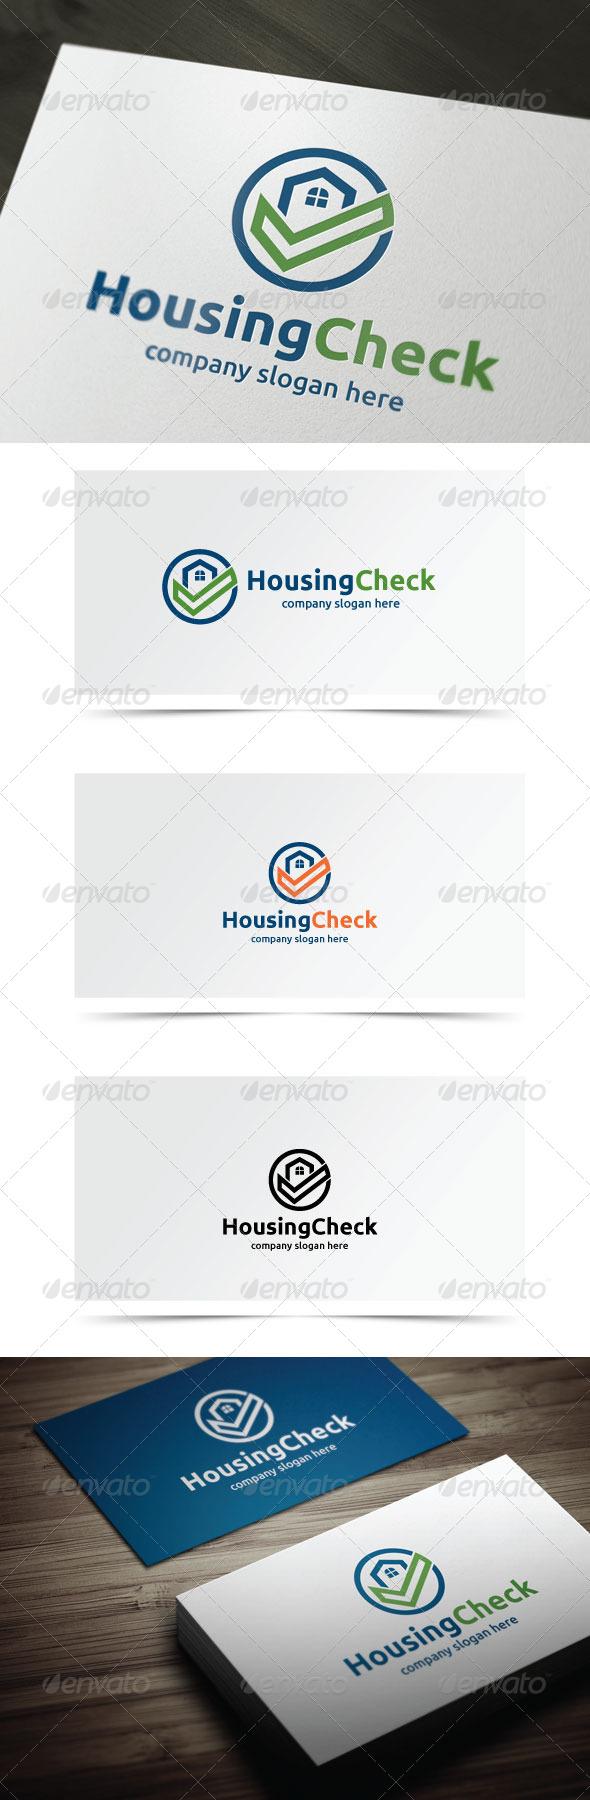 Housing Check